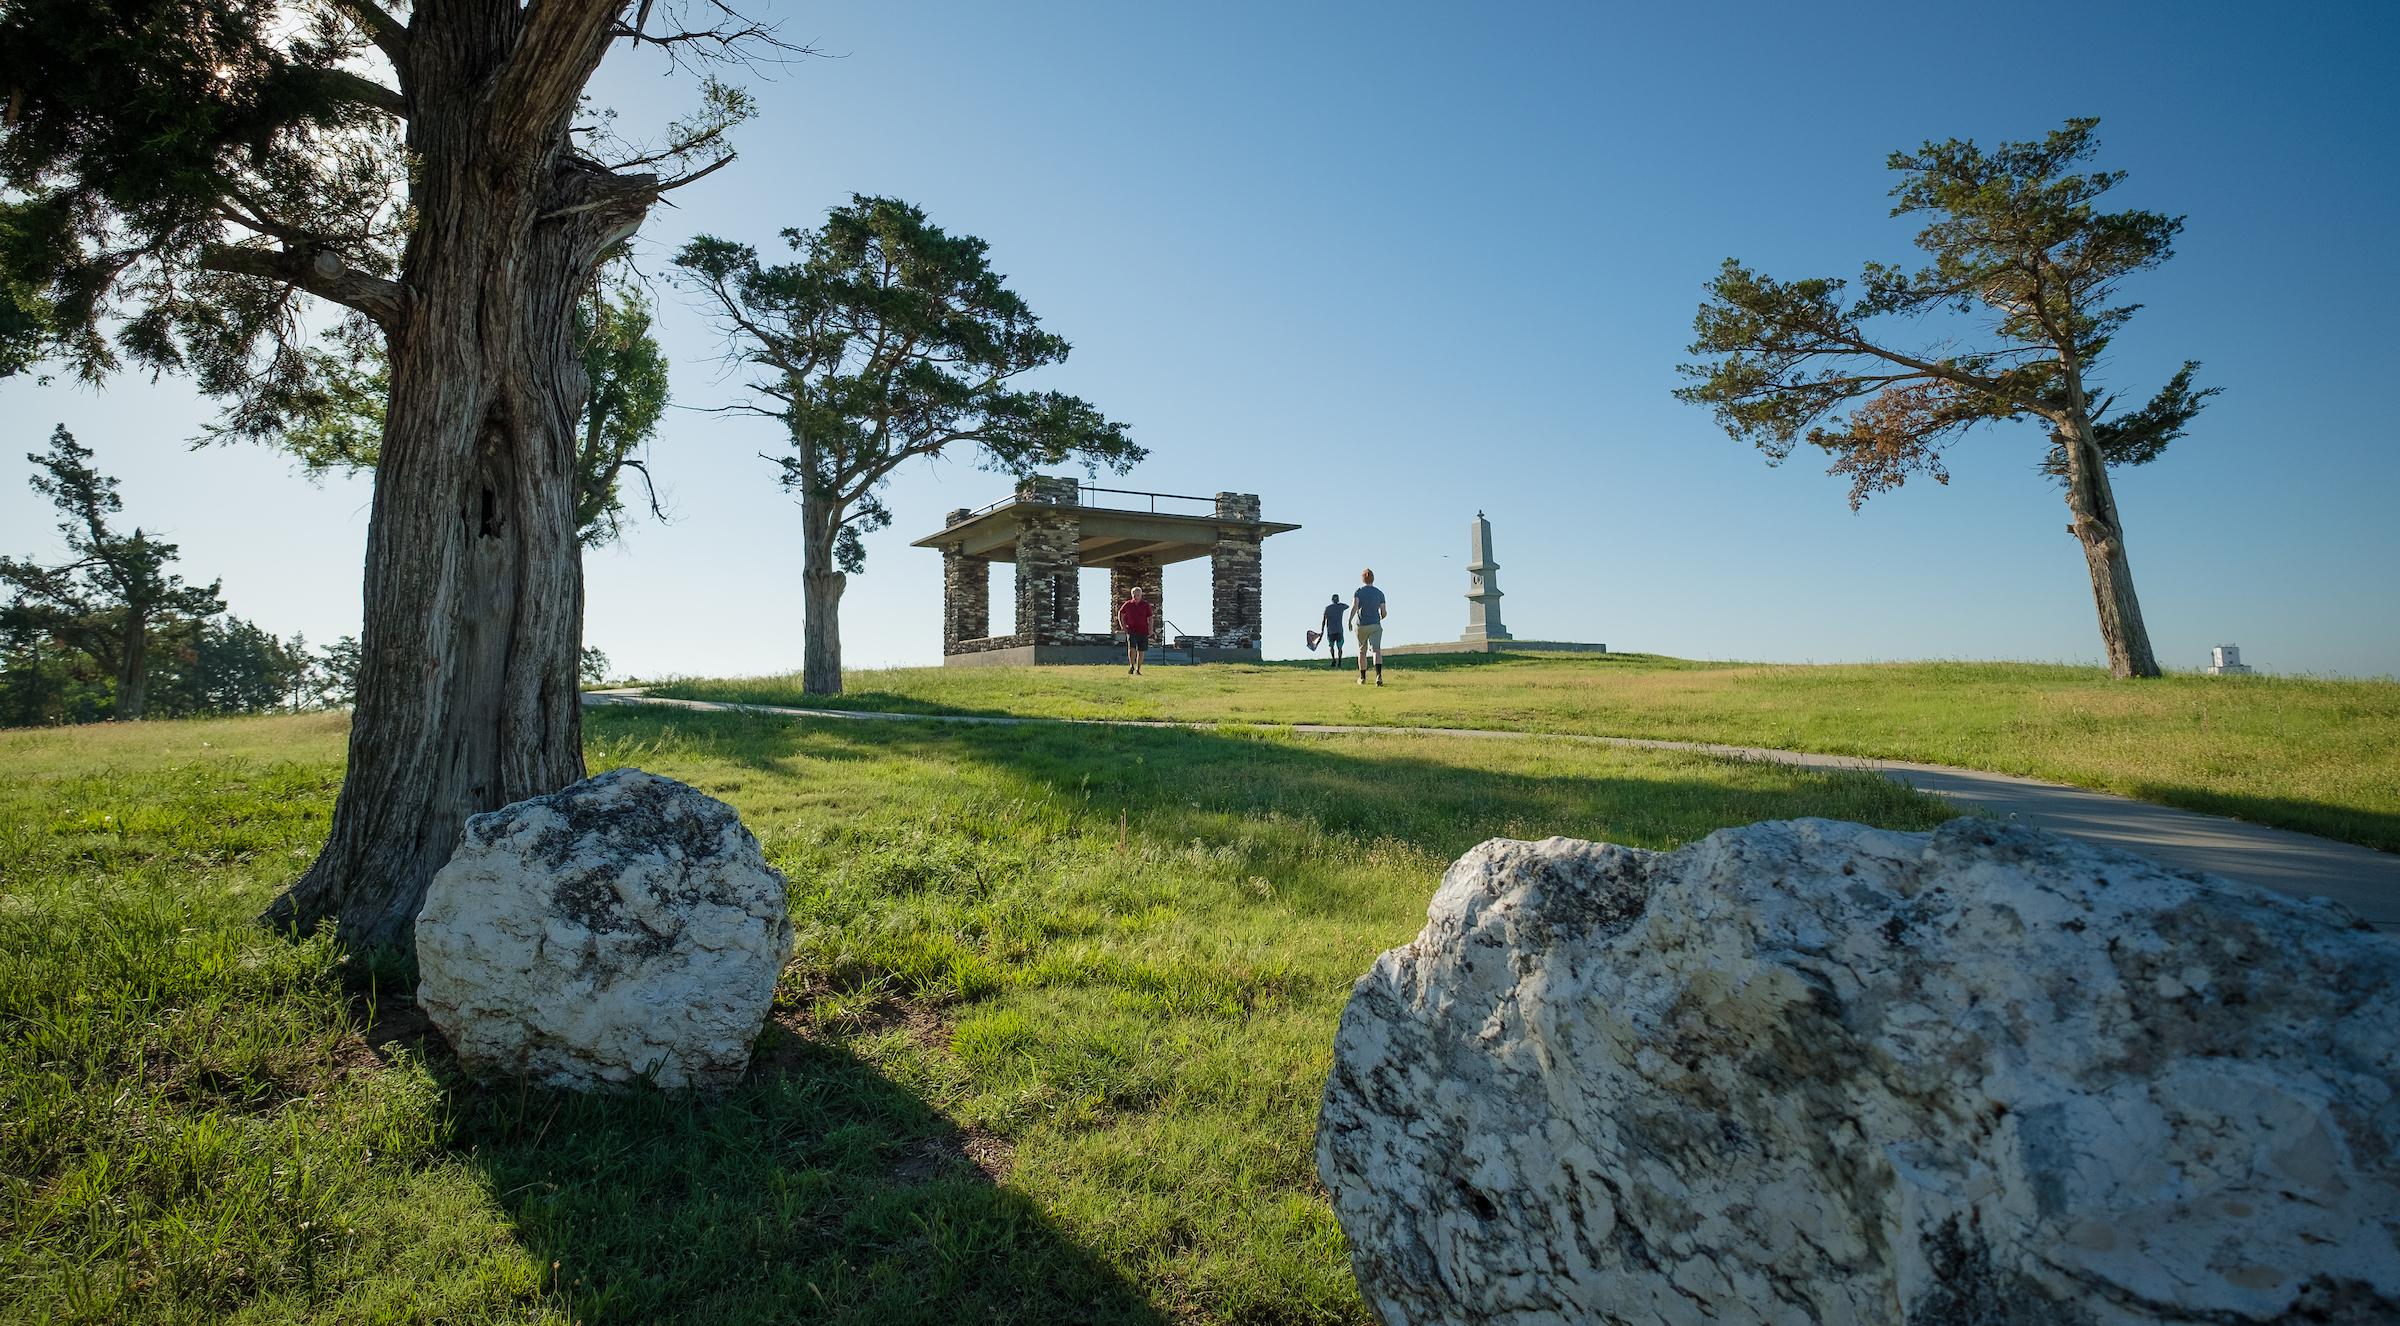 Pawnee Rock State Historic Site